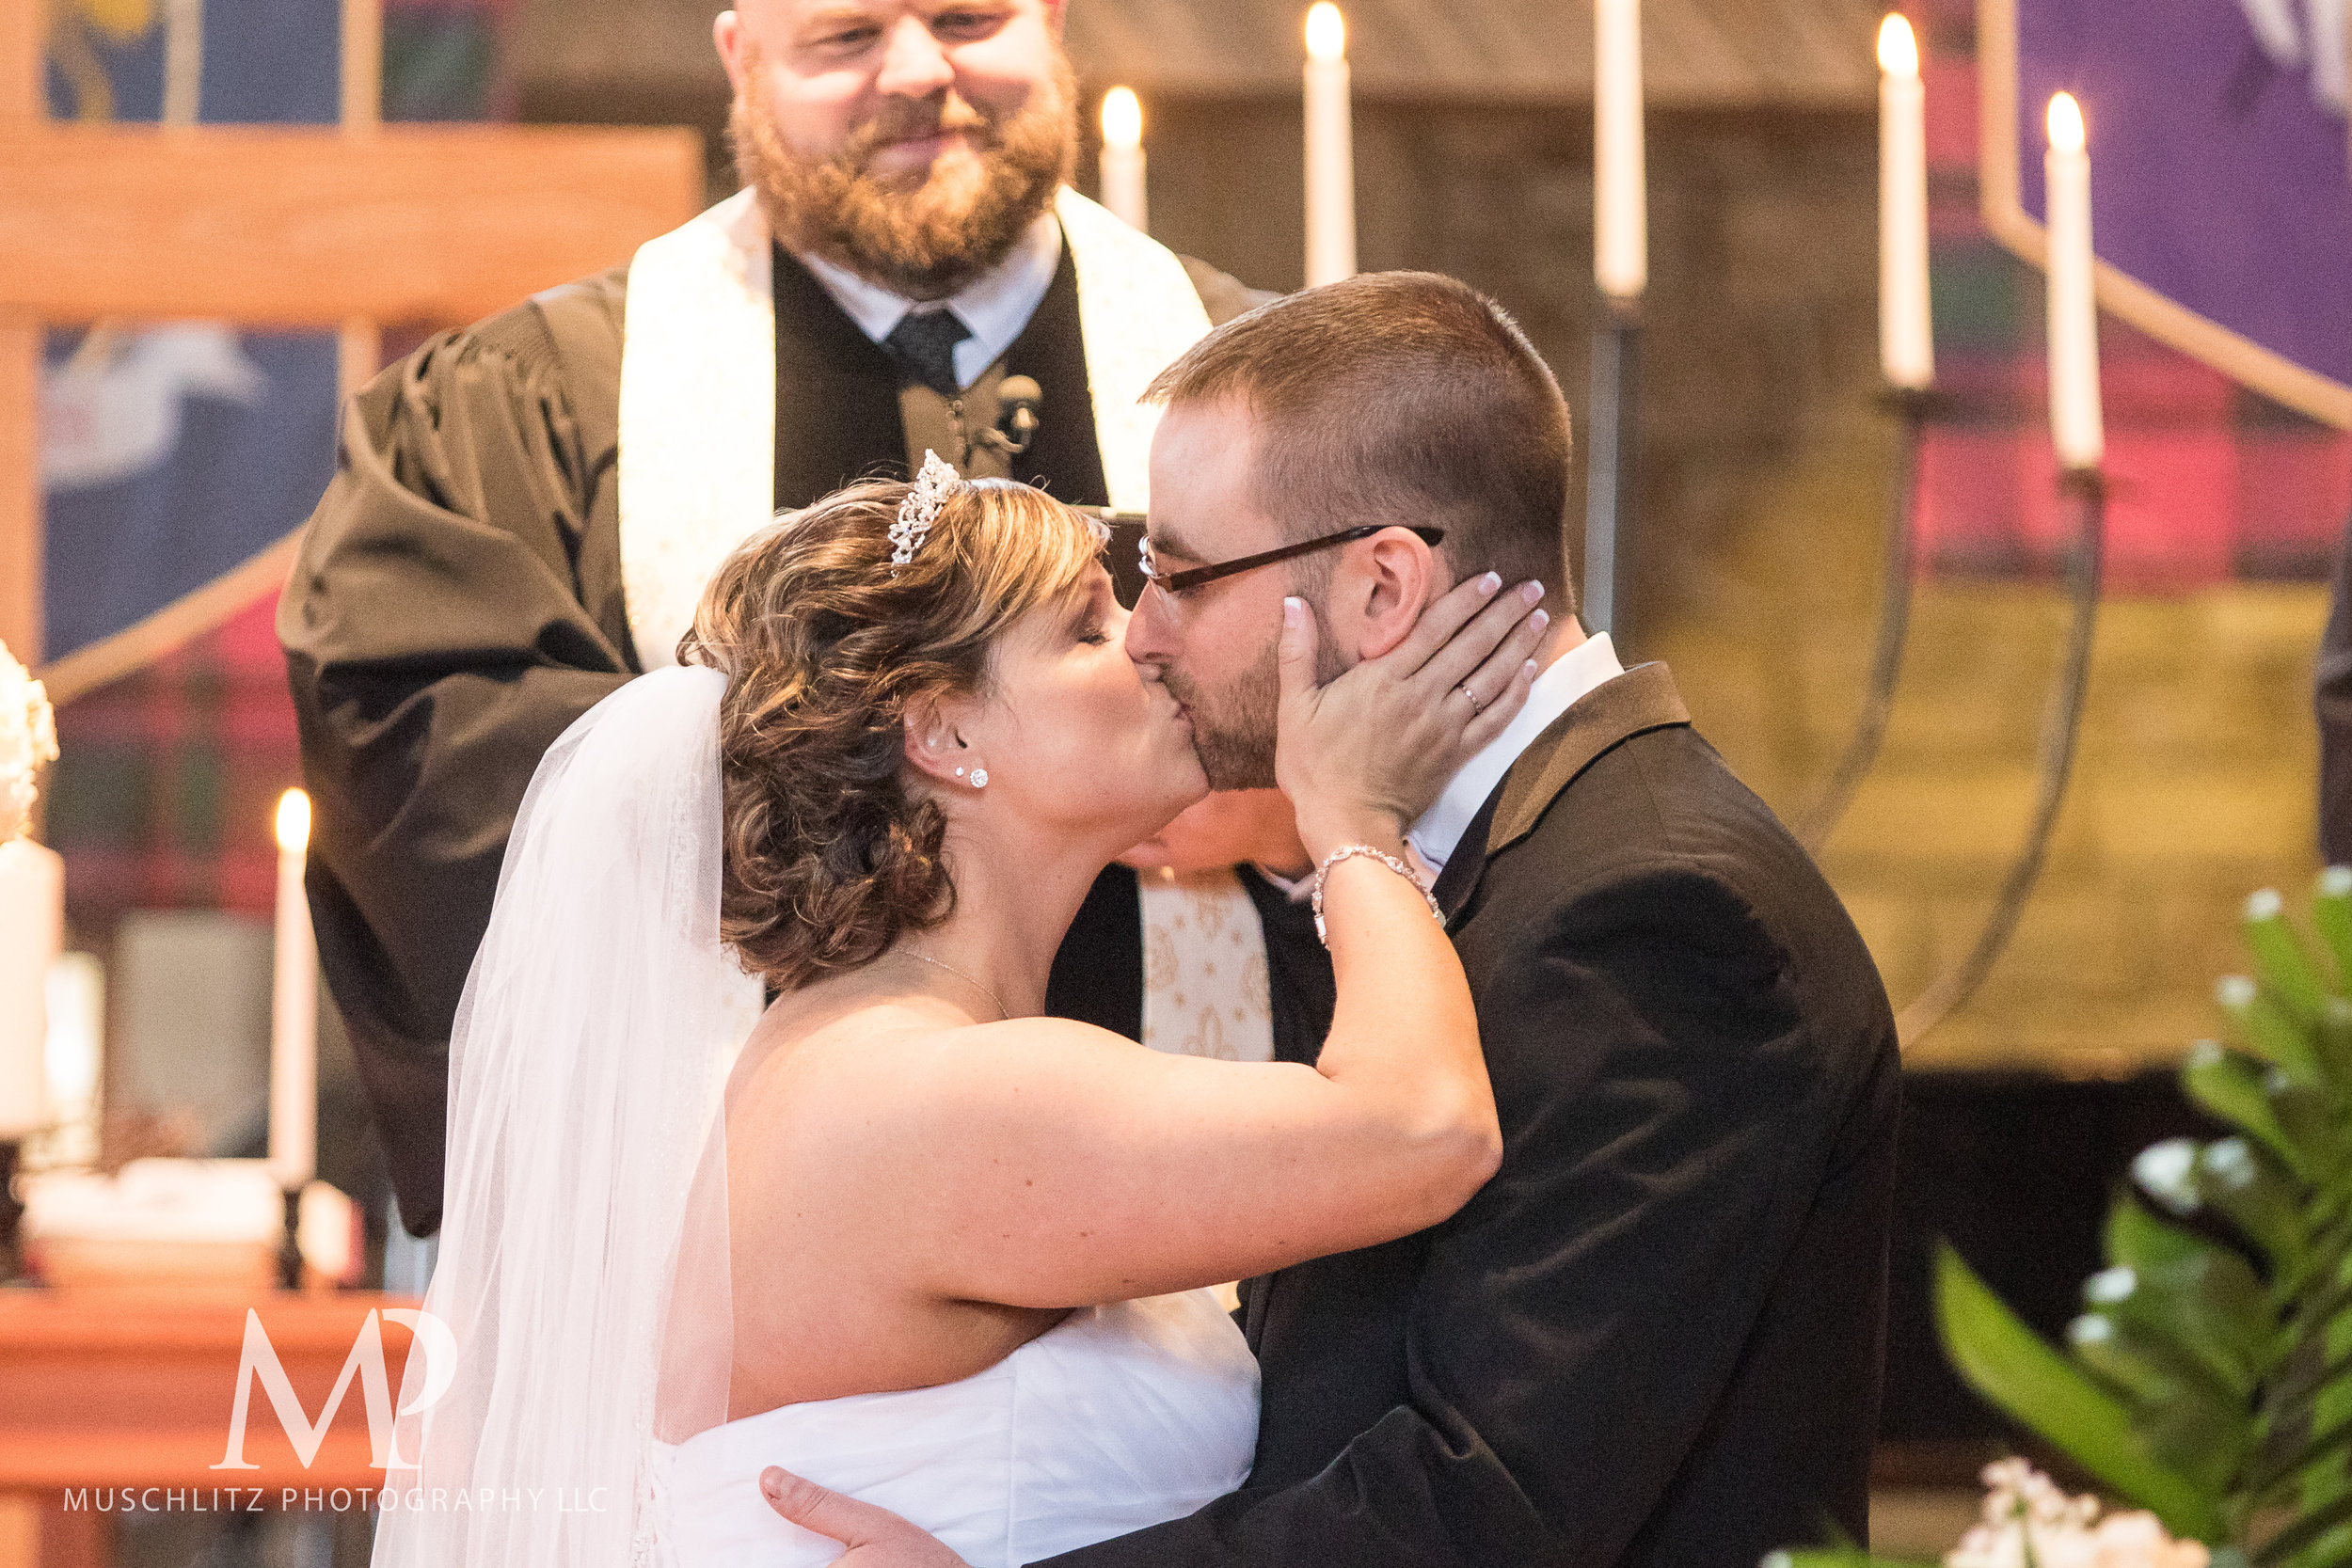 liberty-barn-presbyterian-church-wedding-delaware-columbus-ohio-muschlitz-photography-041.JPG